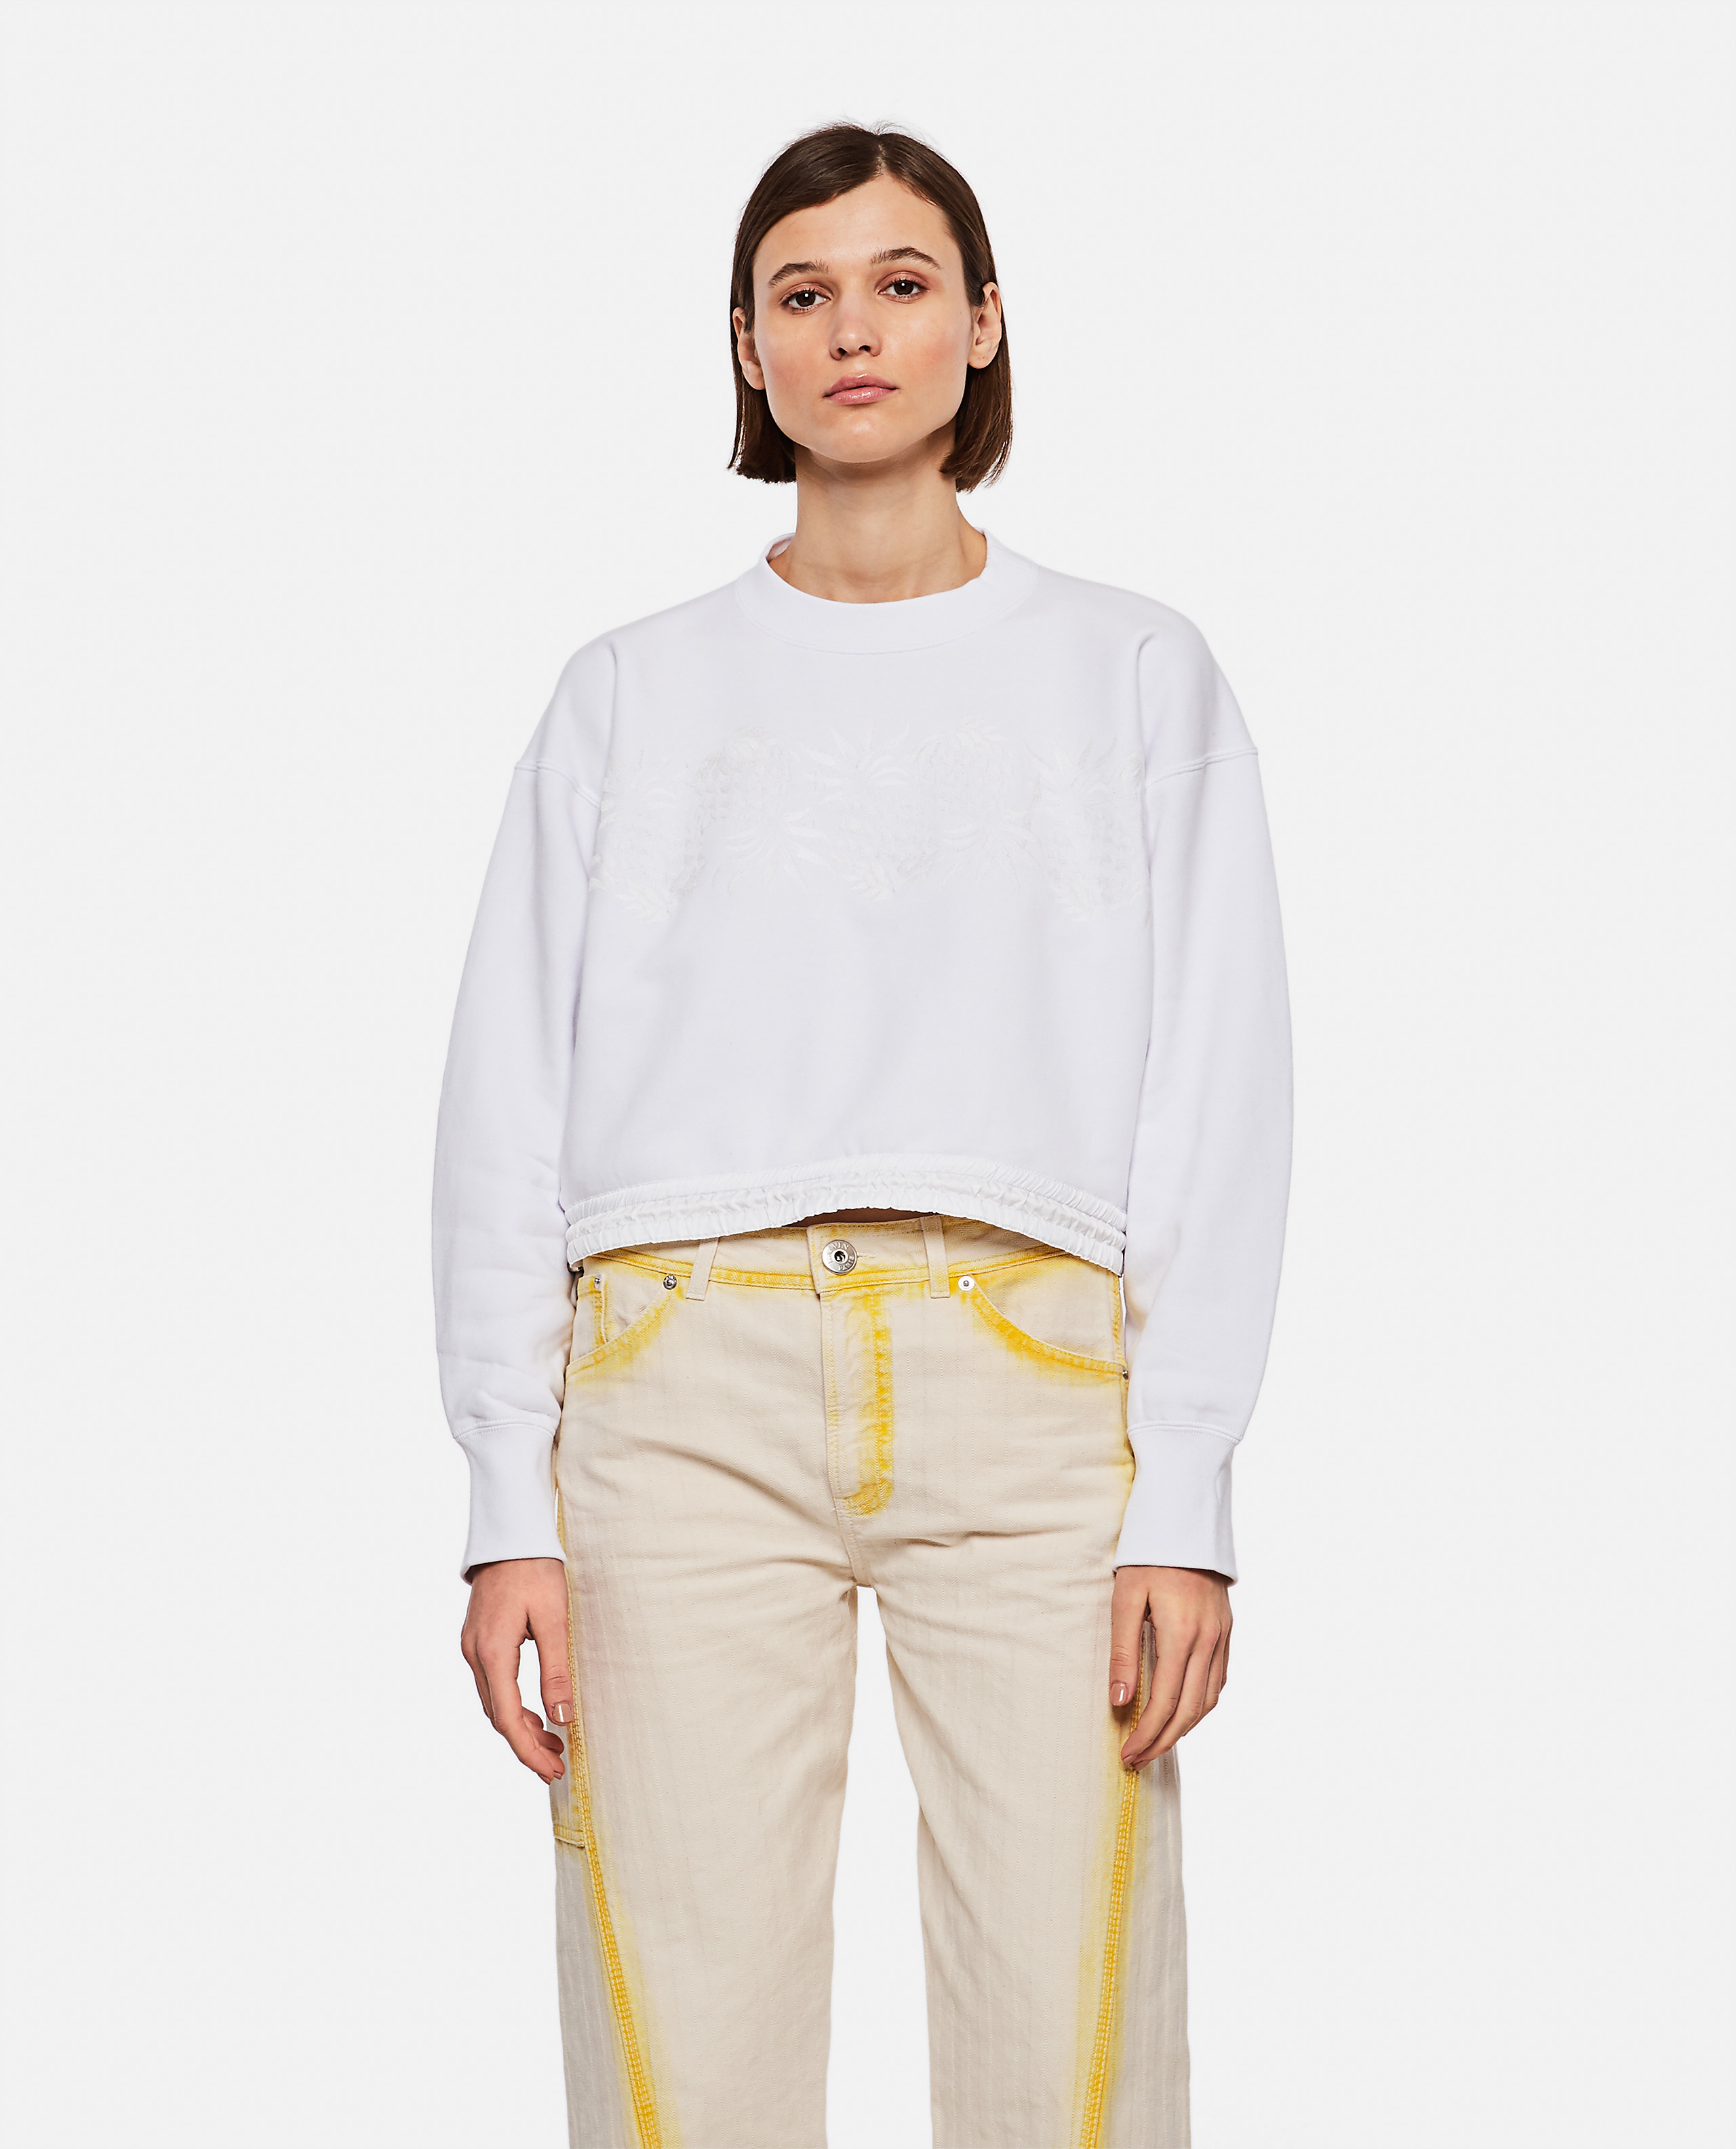 Sun Surf sweatshirt